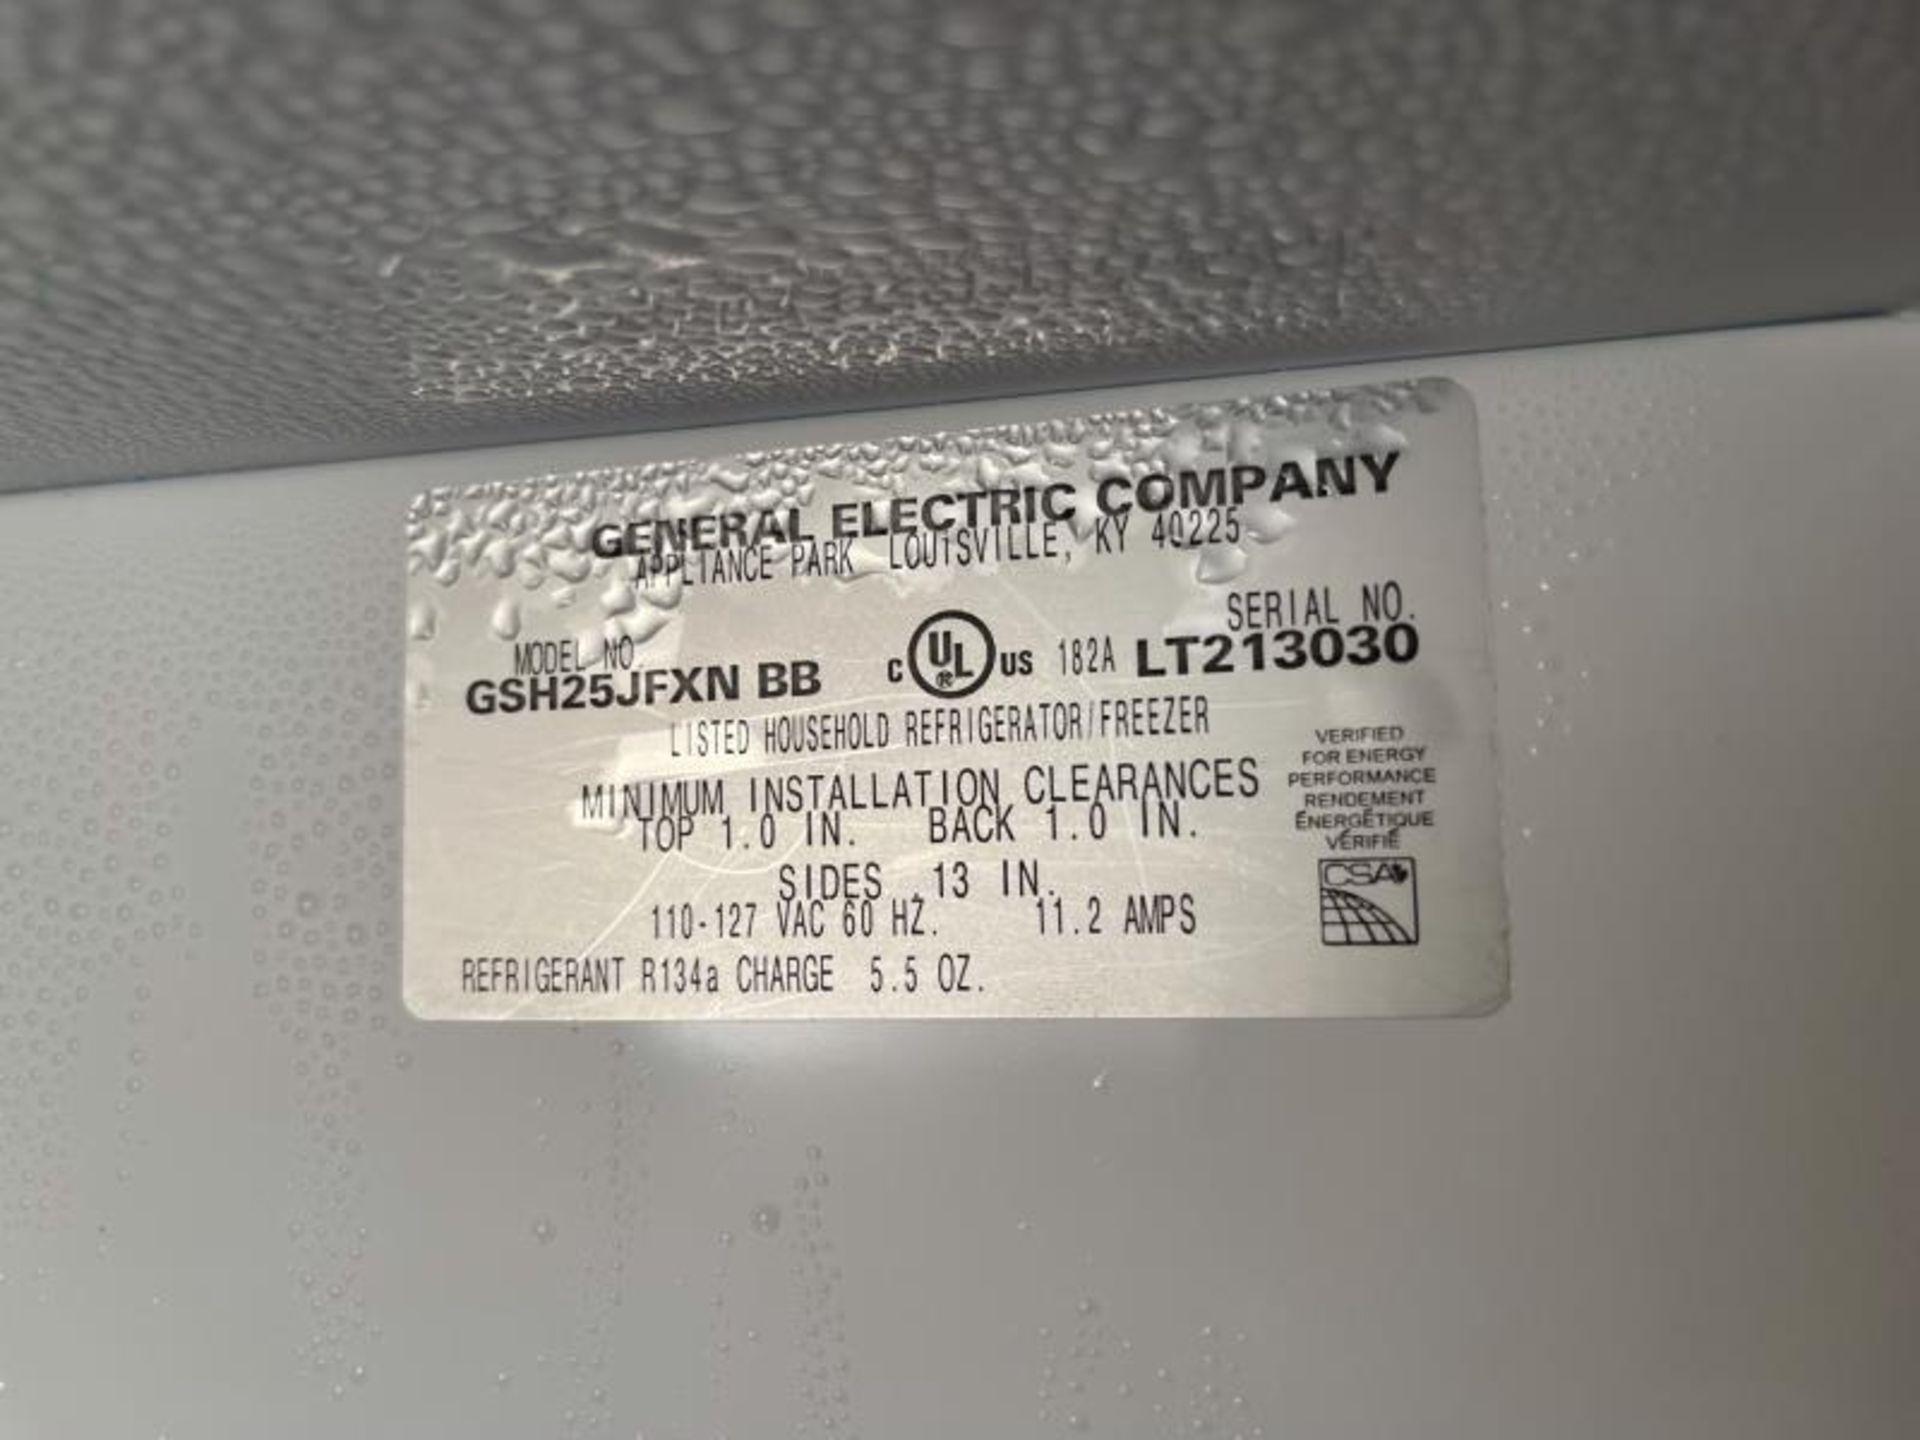 Amana French Dorr Refrigerator with Ice Machine (Needs Refrigerator Door Gasket) M: GSH25JFYNDB - Image 5 of 5